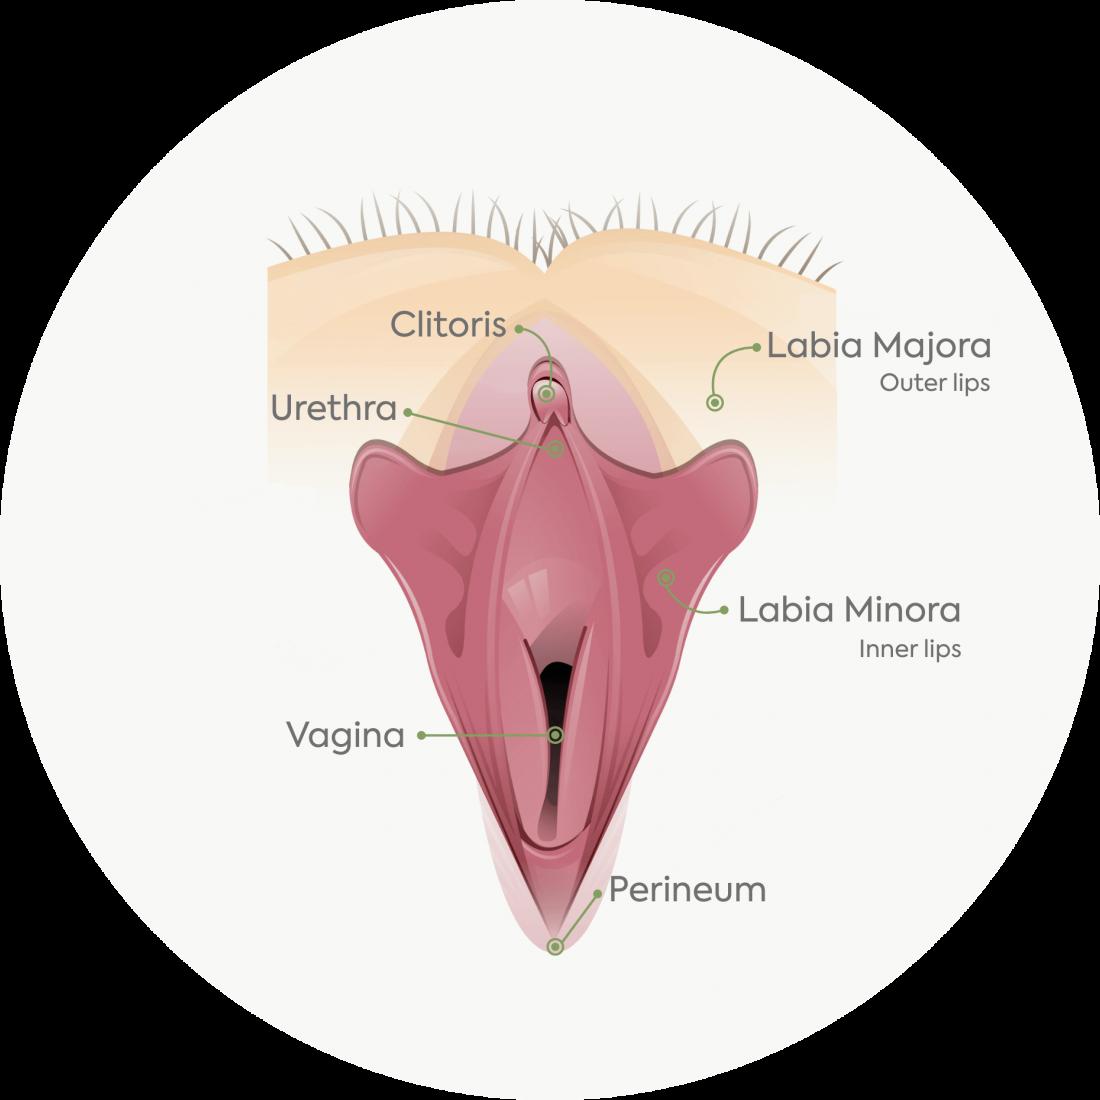 Dettagli Procedurali: Labioplastica